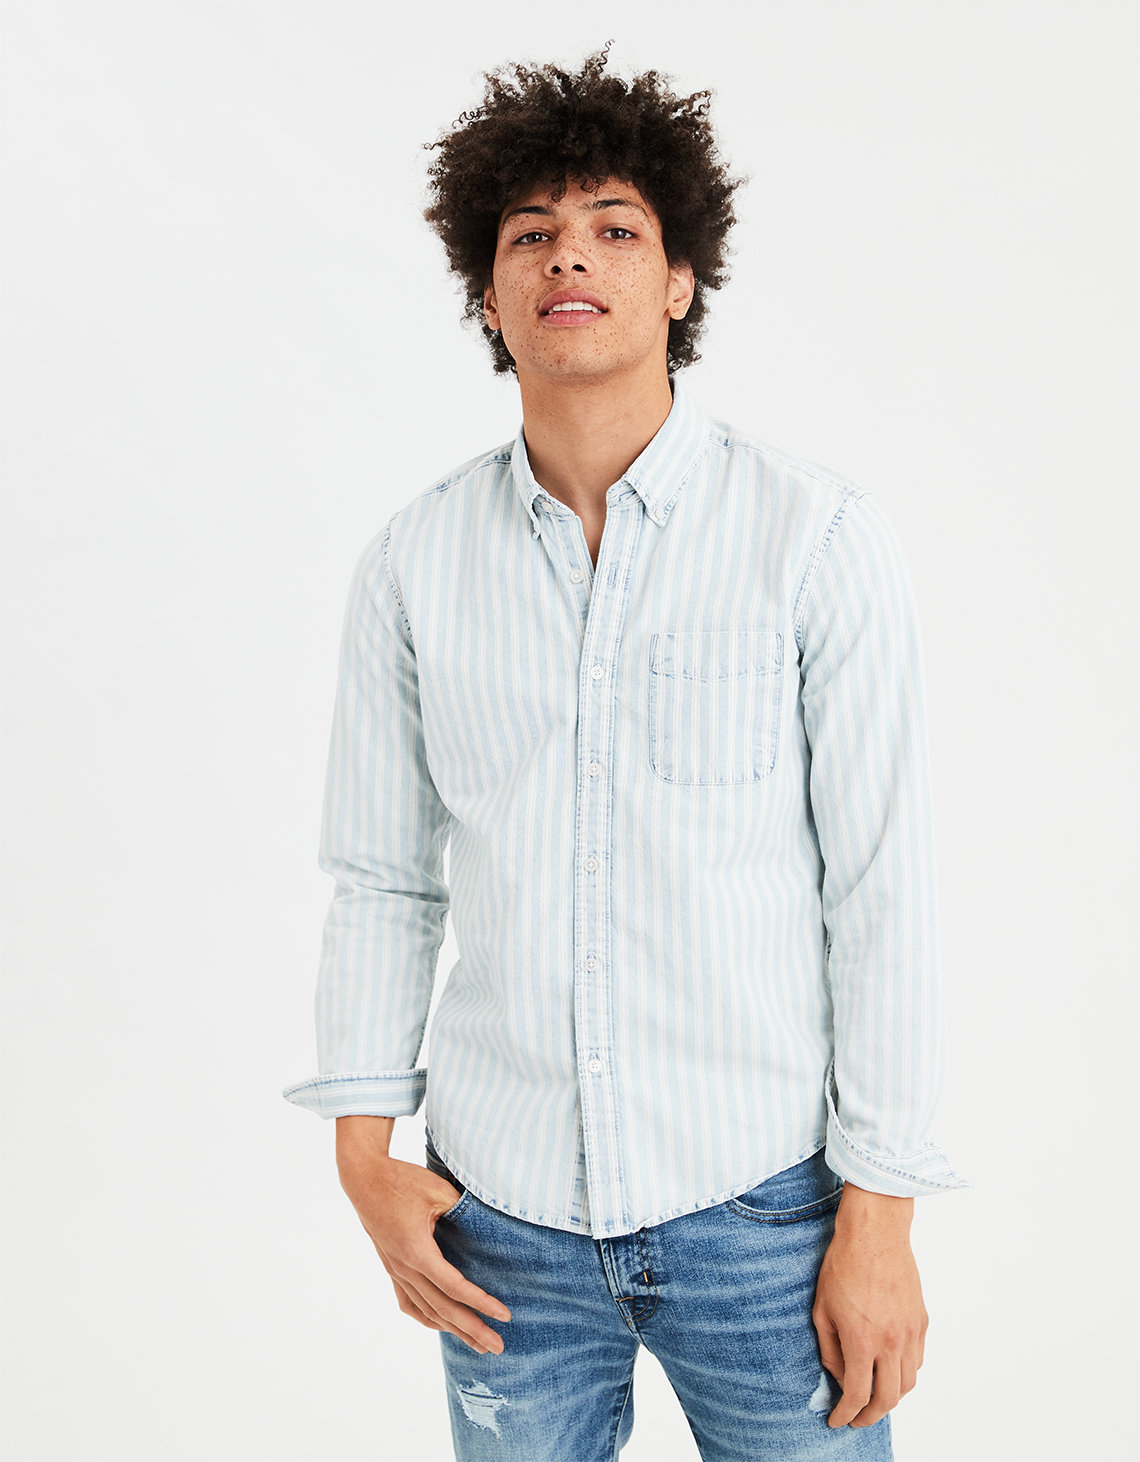 3eb7d9d5b44b46 ... Button Down Shirt. Placeholder image. Product Image